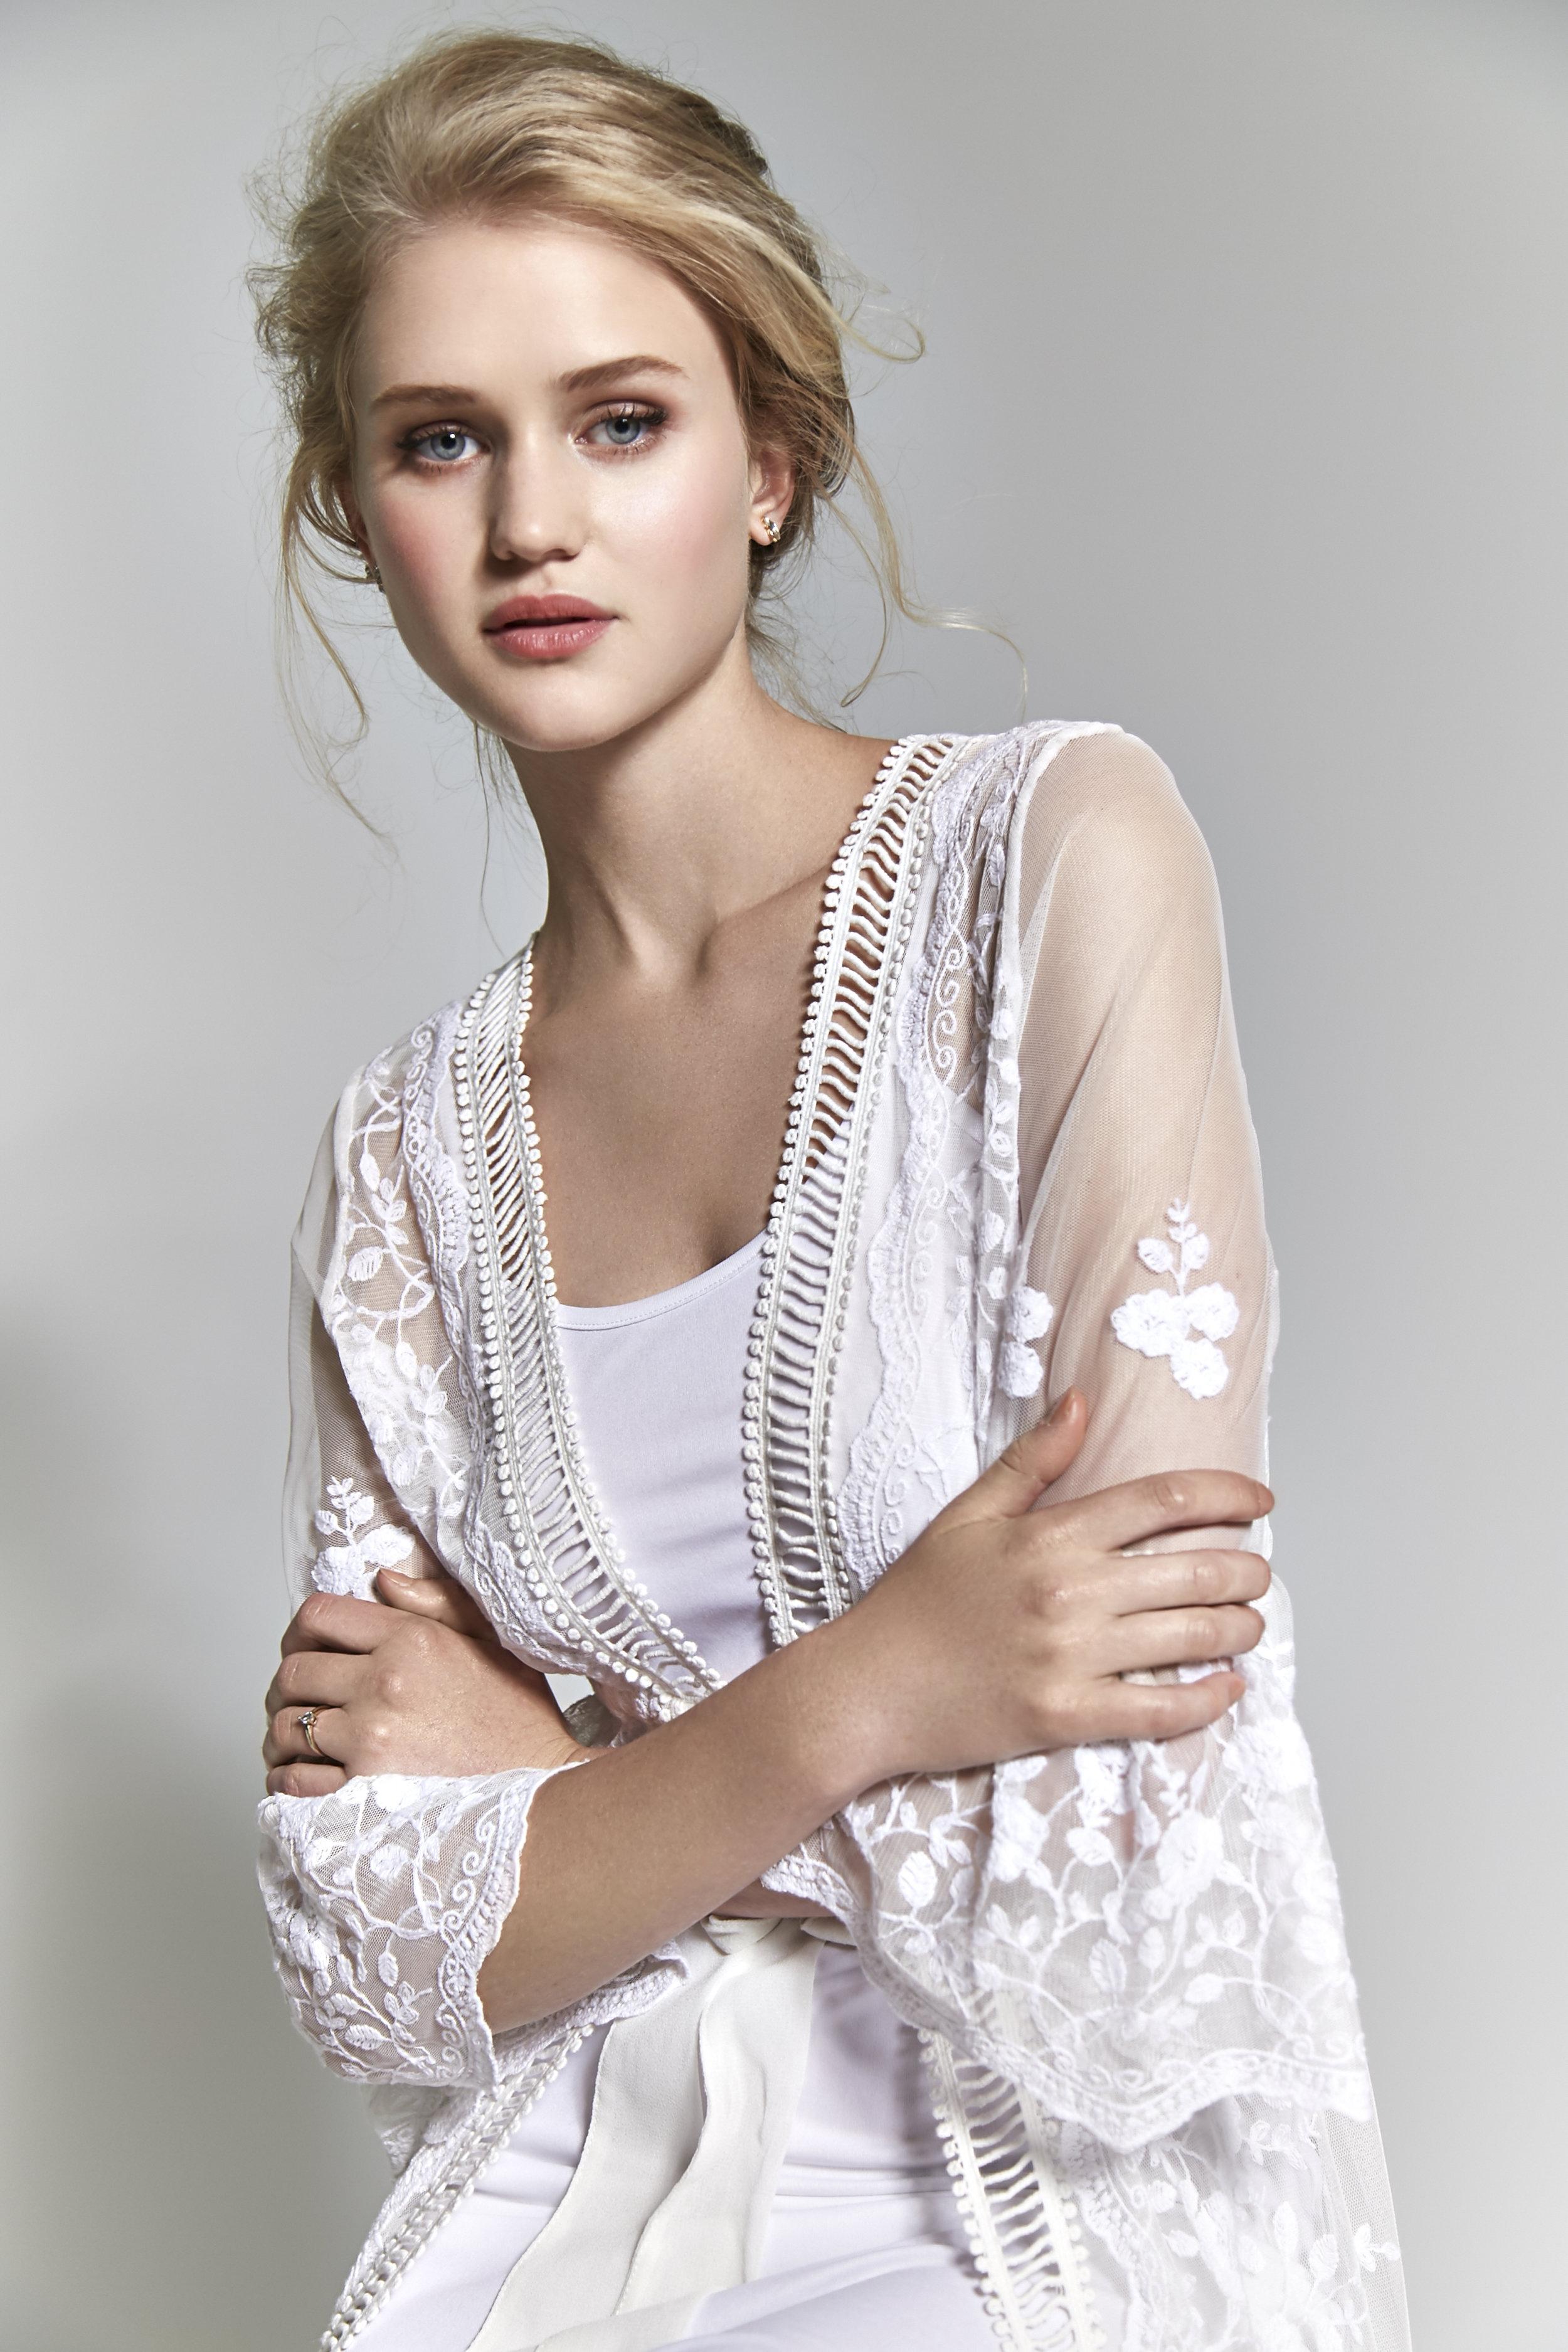 Fabiana_beauty test67862 FINAL (Siviec).jpg